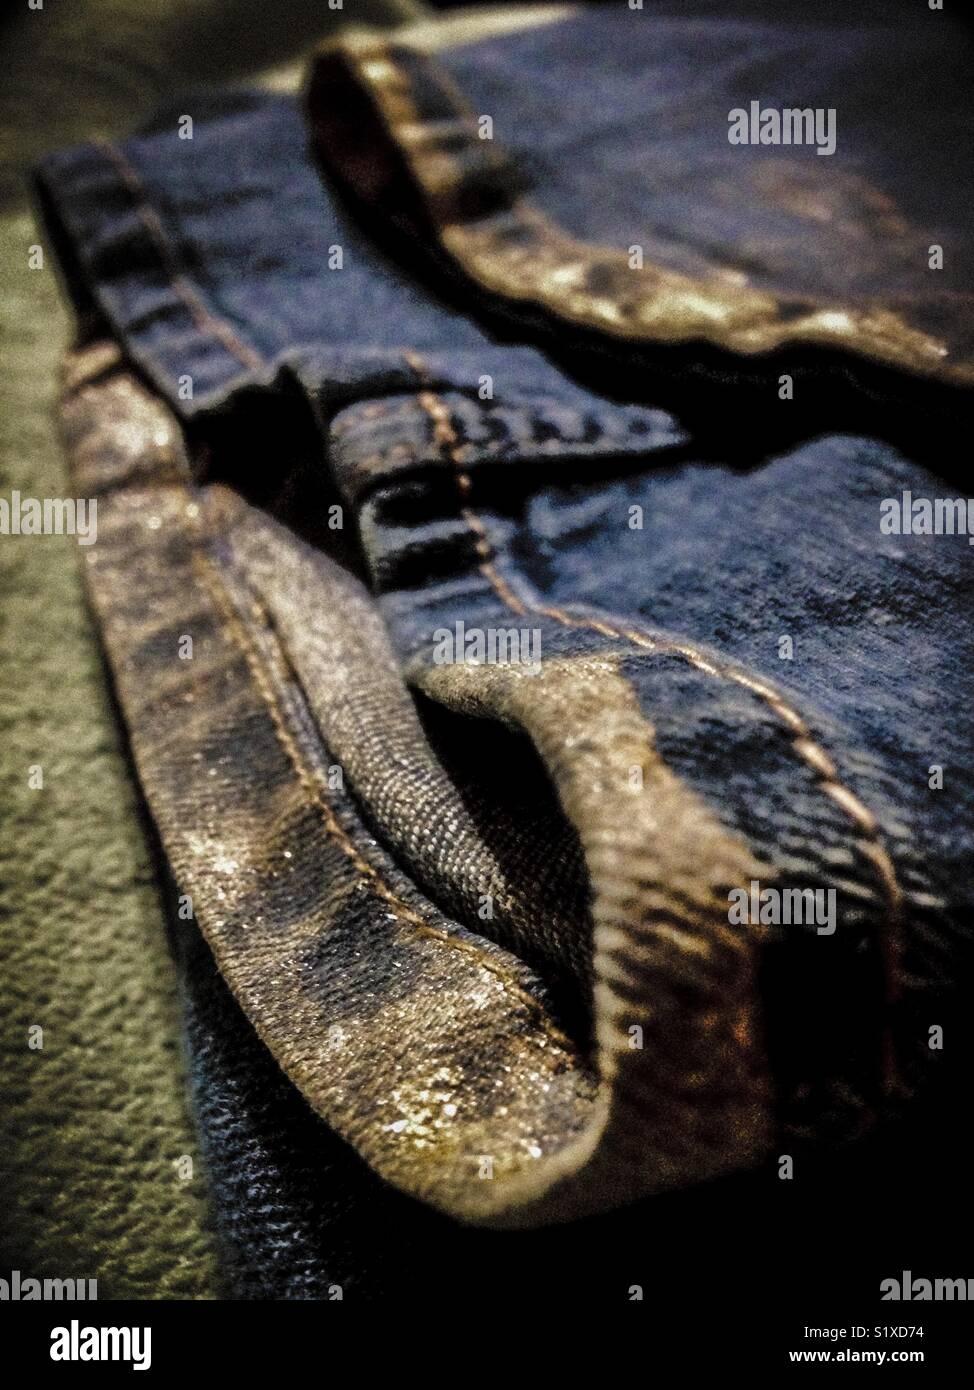 Shimmer of mica on muddy hem - Stock Image